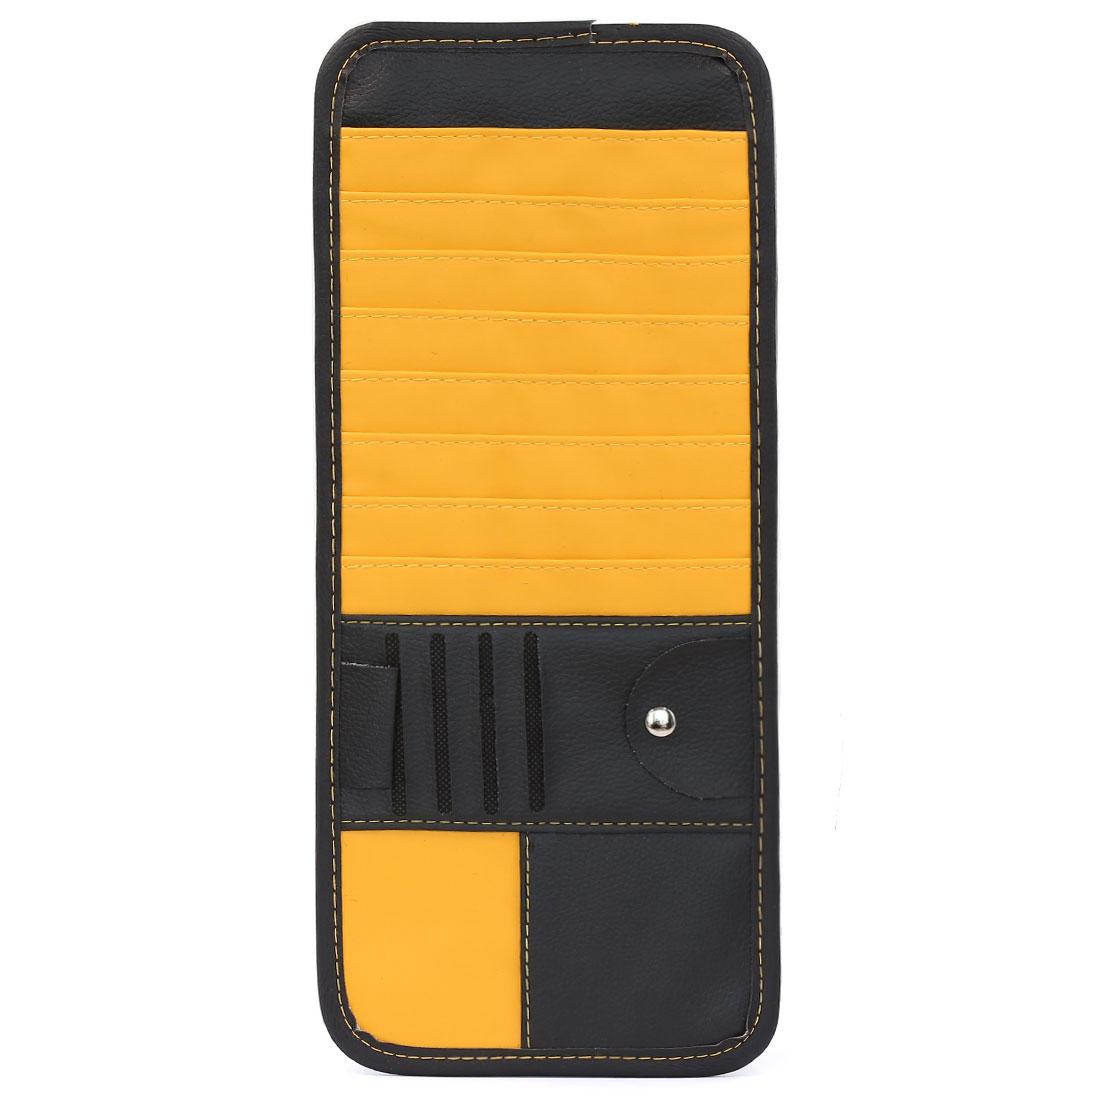 Auto Car 14 Pockets CD DVD Sun Visor Storage Organizer Holder Case Black Yellow